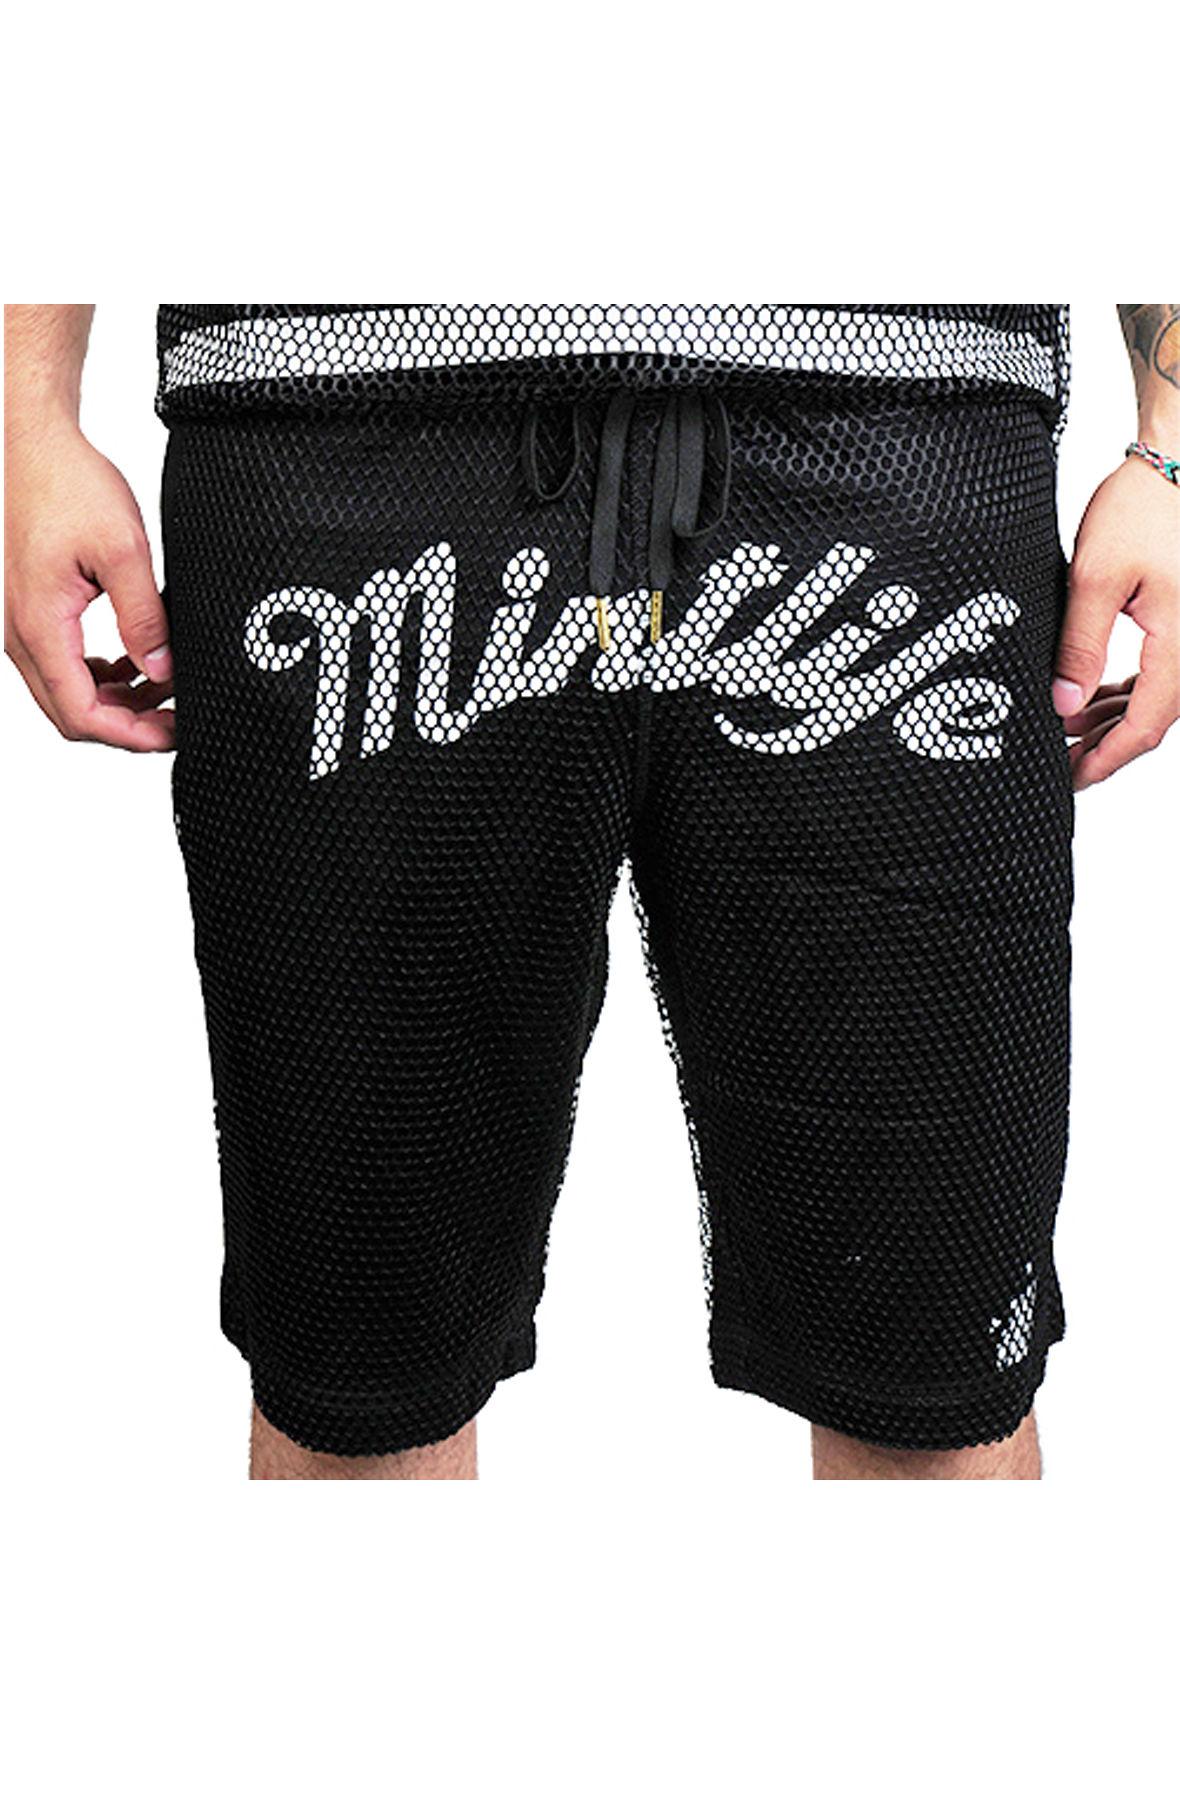 Image of Mintlife Jersey Short